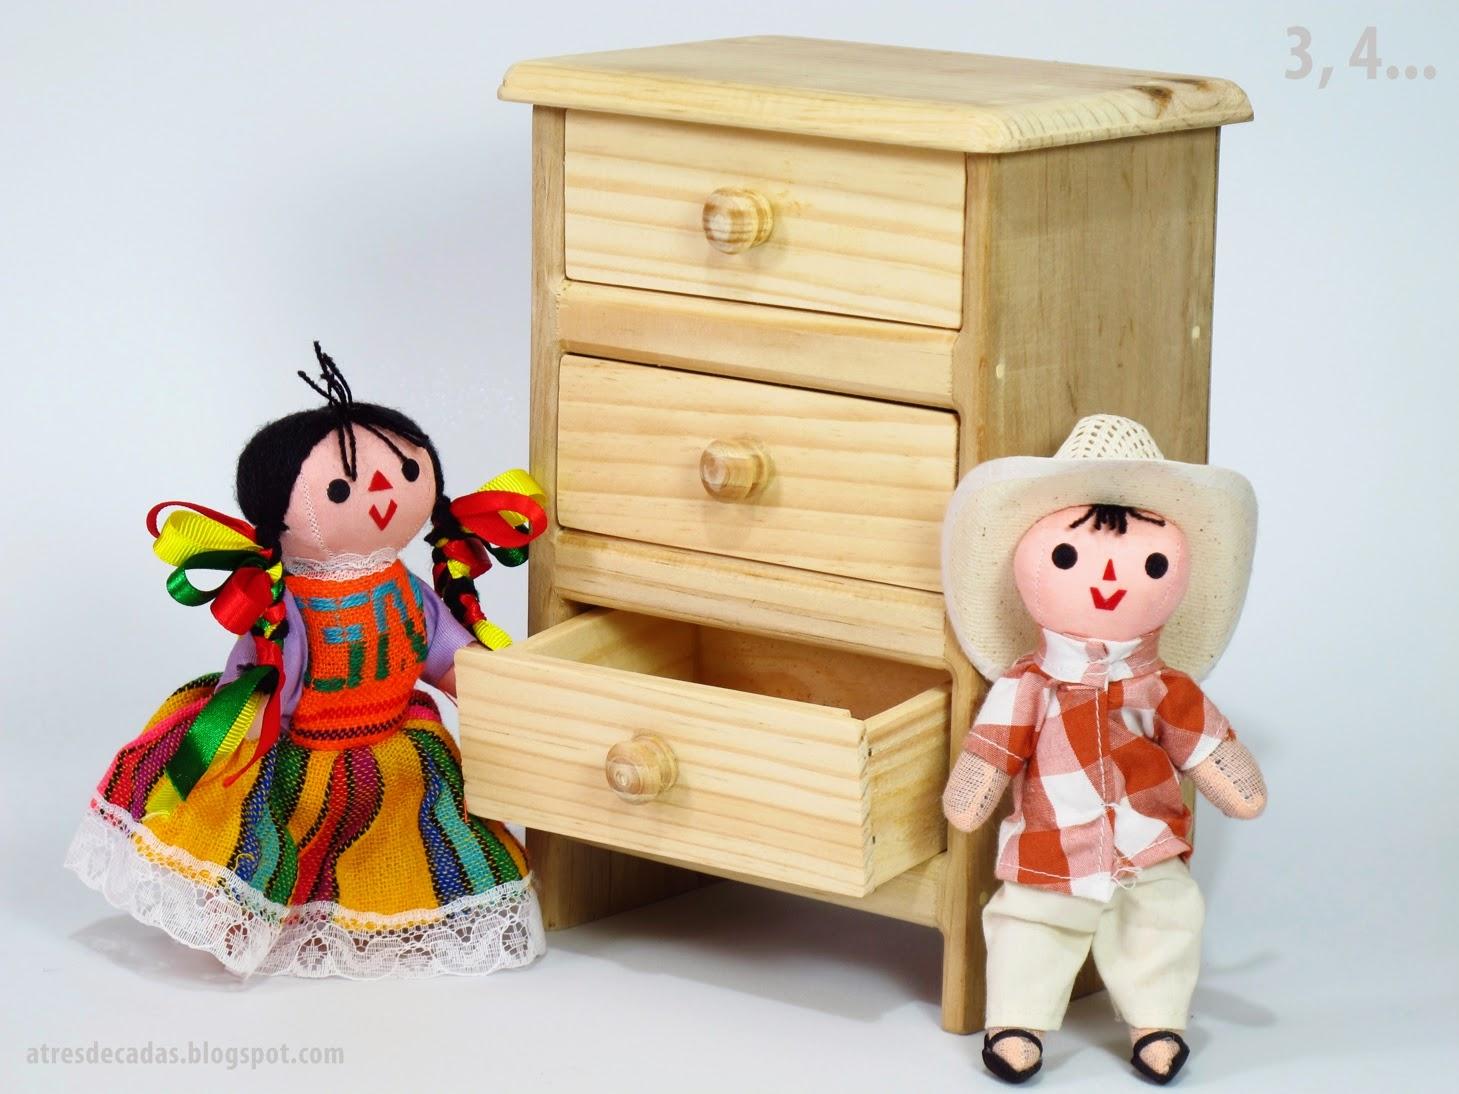 Tressiete muebles de madera de juguete de tlacolula - Muebles artesanales de madera ...